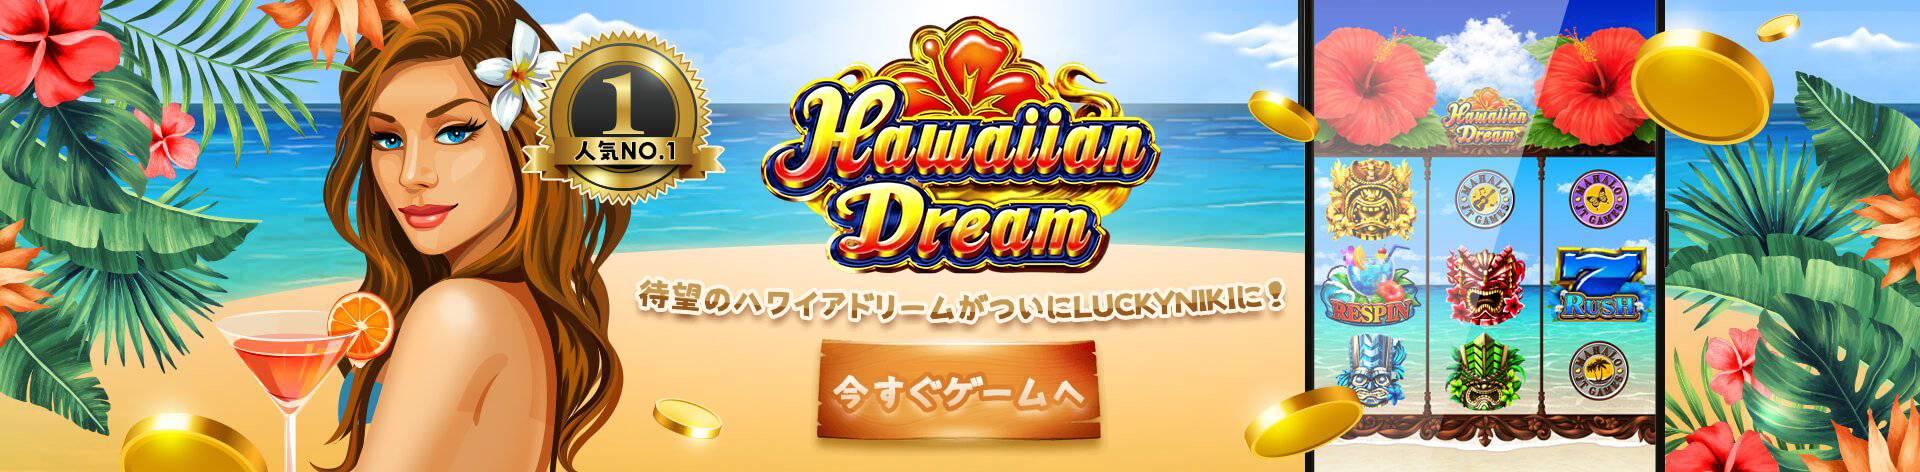 hawaiian_dream_jp